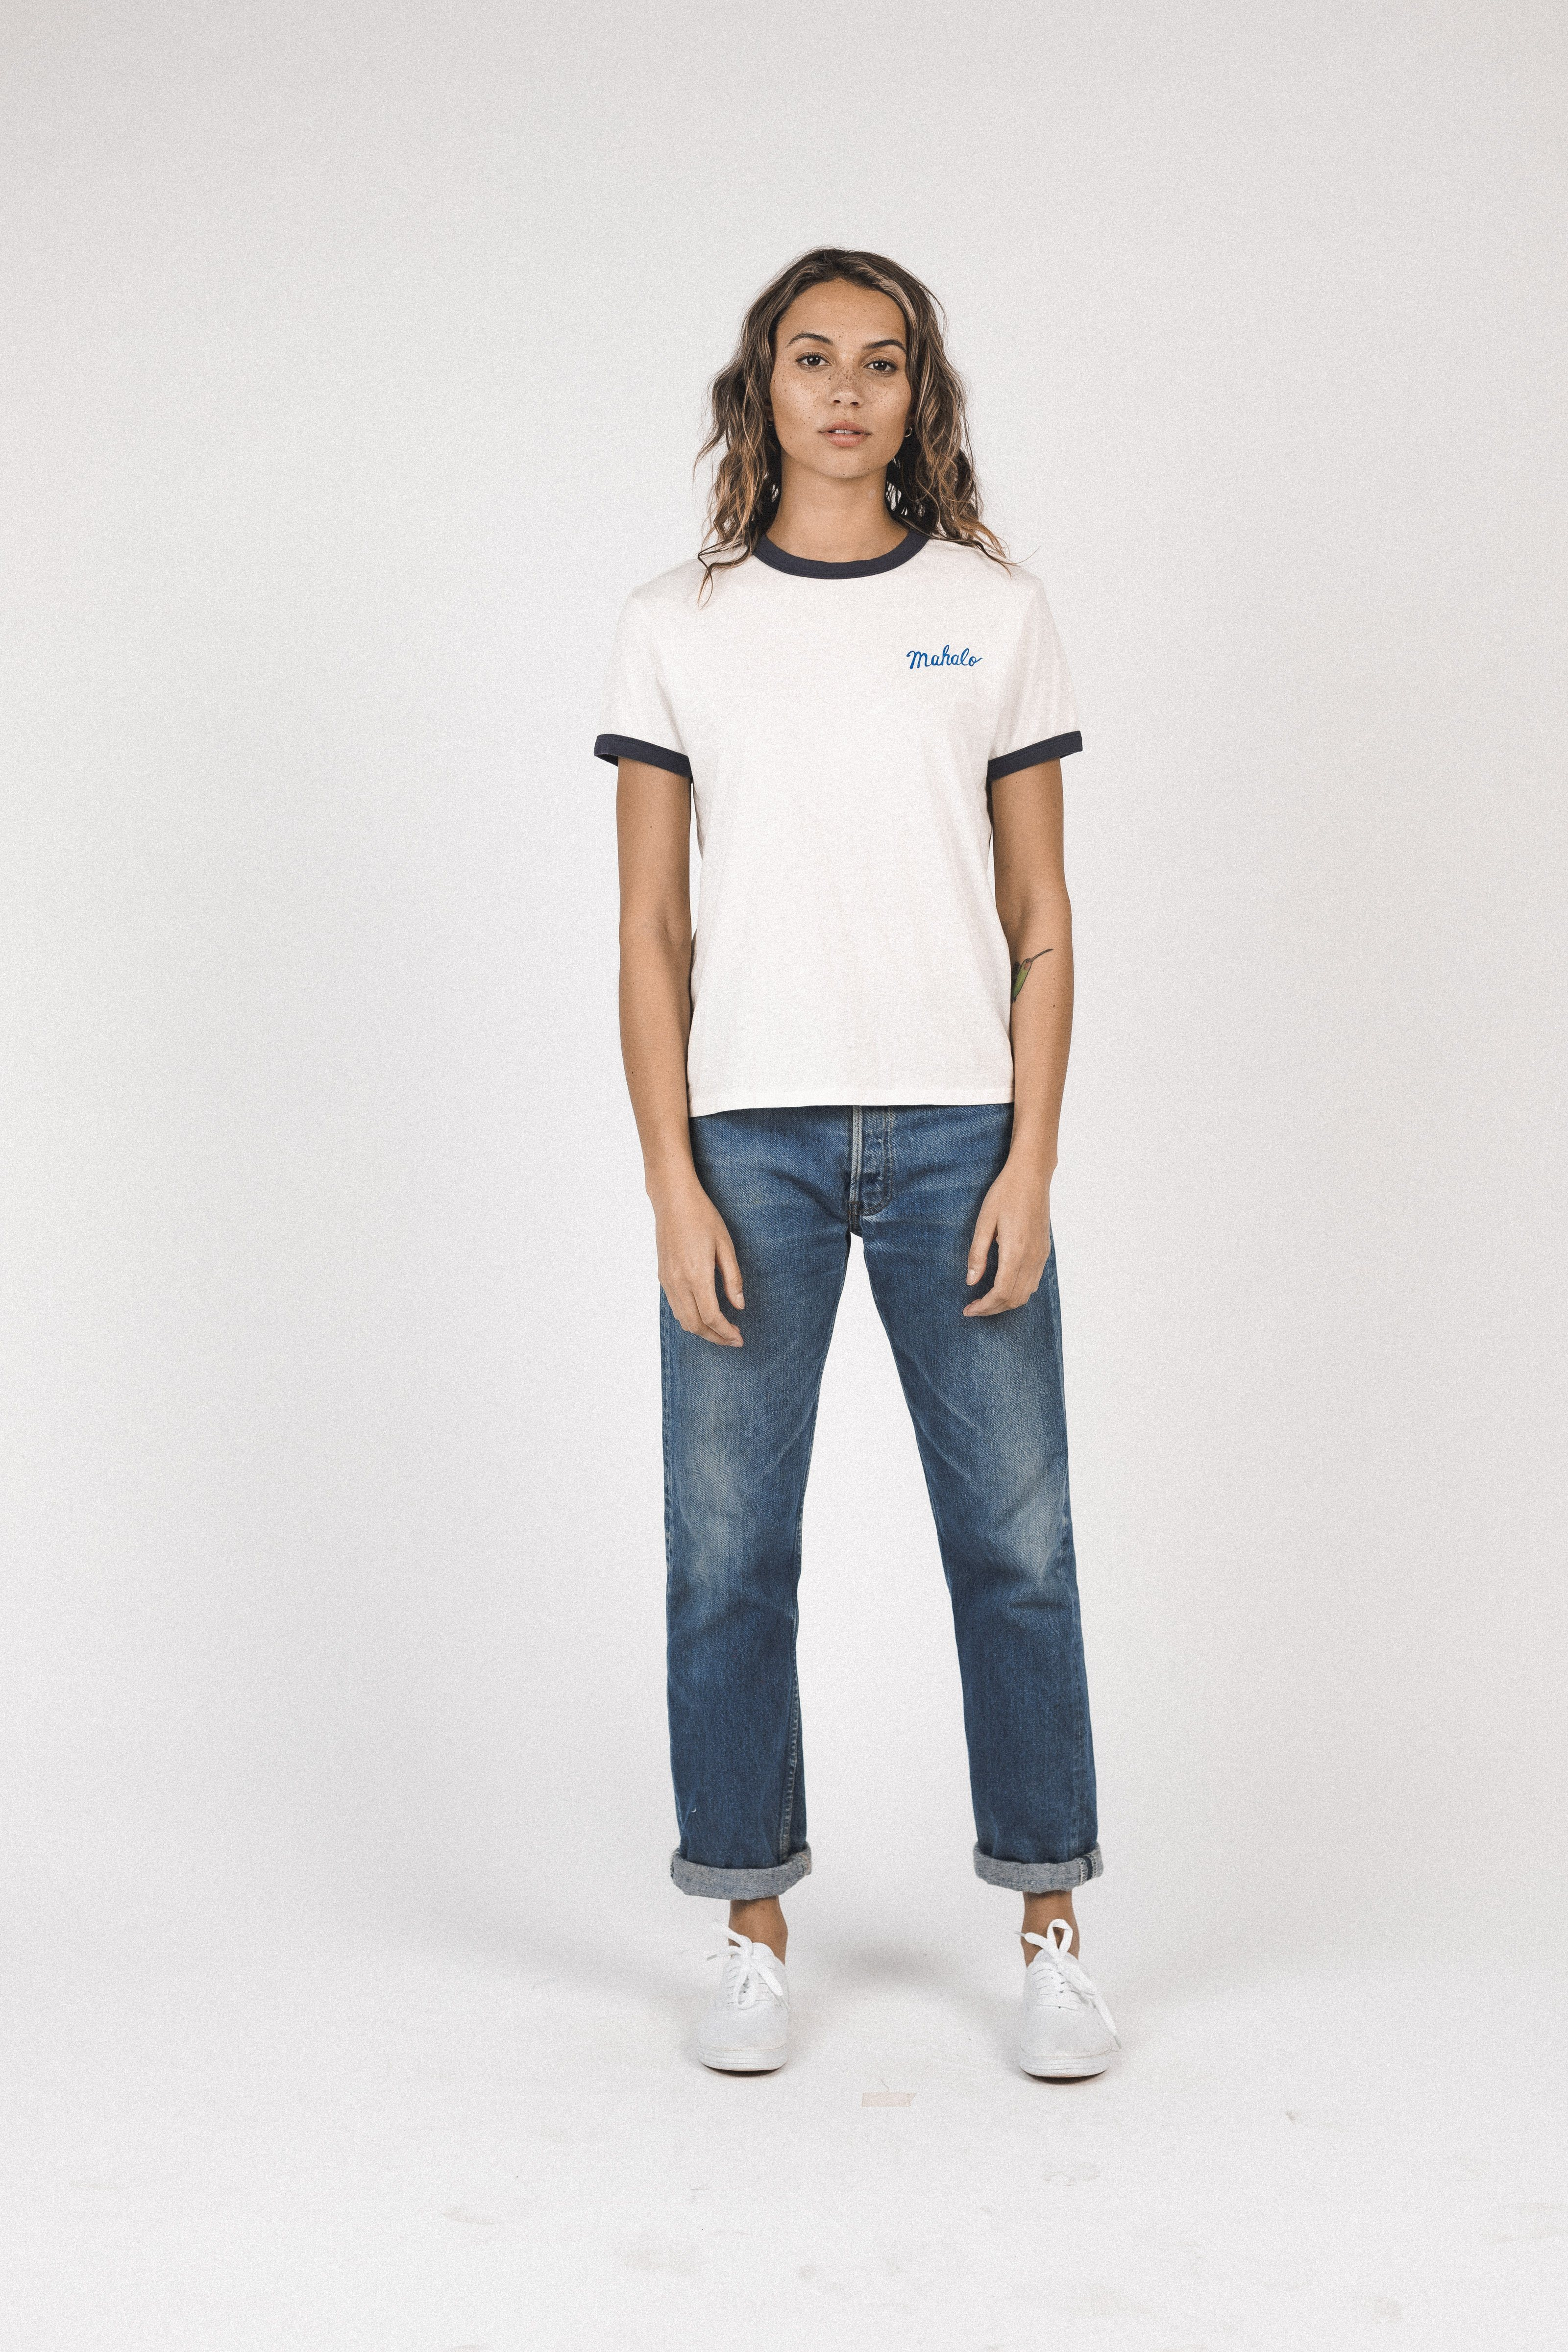 Lennox ringer T-shirt ANT WHITE MAHALO by Trovata - 5